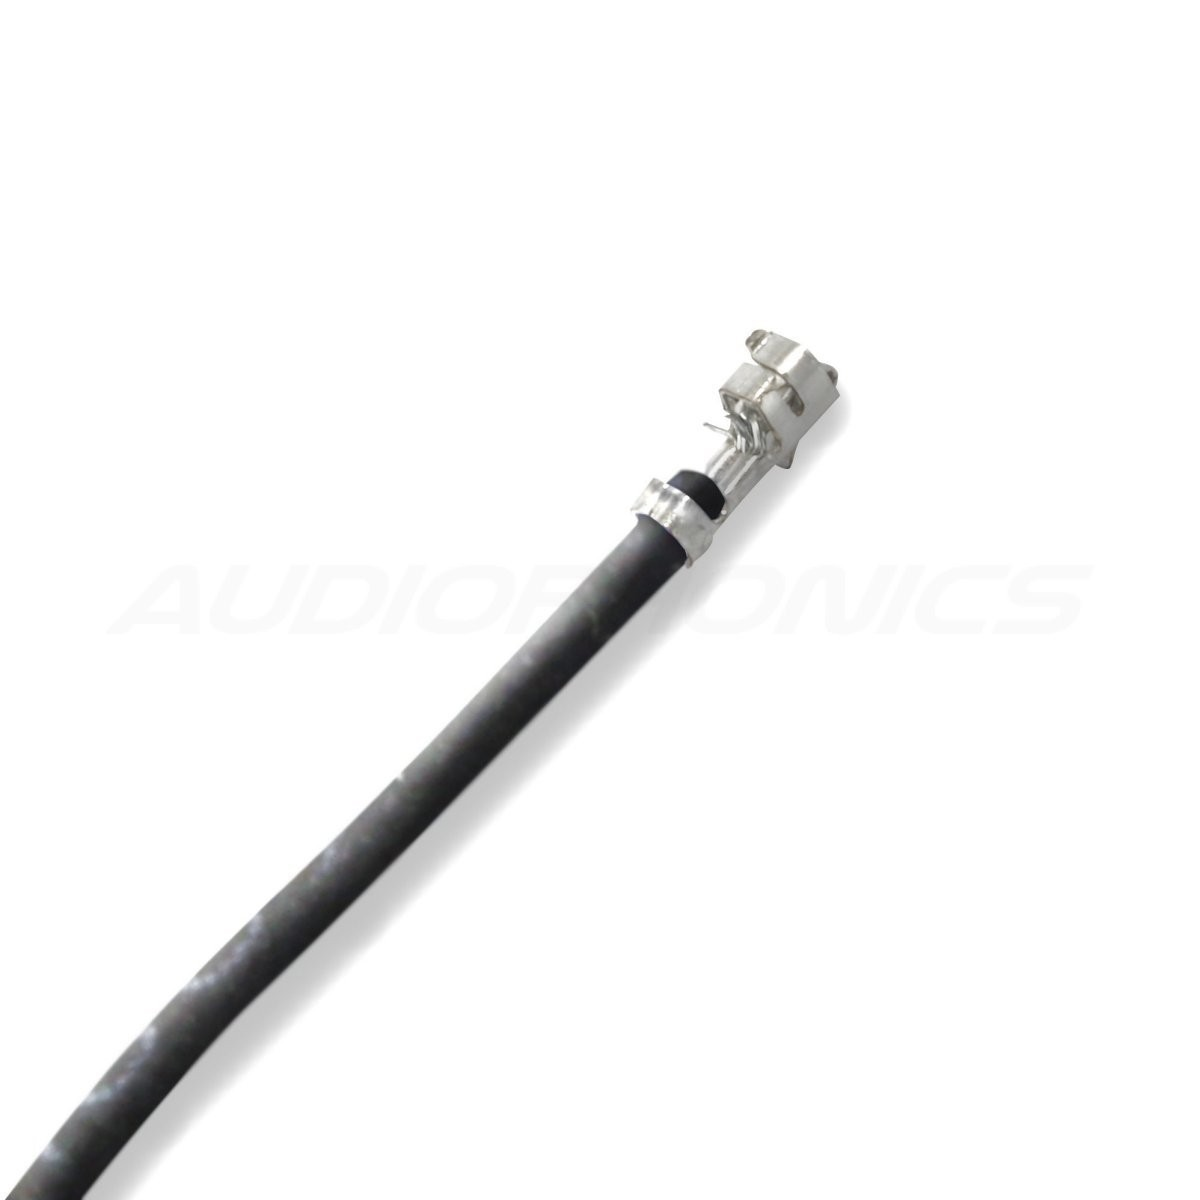 Câble XH 2.54mm Femelle / Femelle Sans boîtier Noir 15cm (x10)